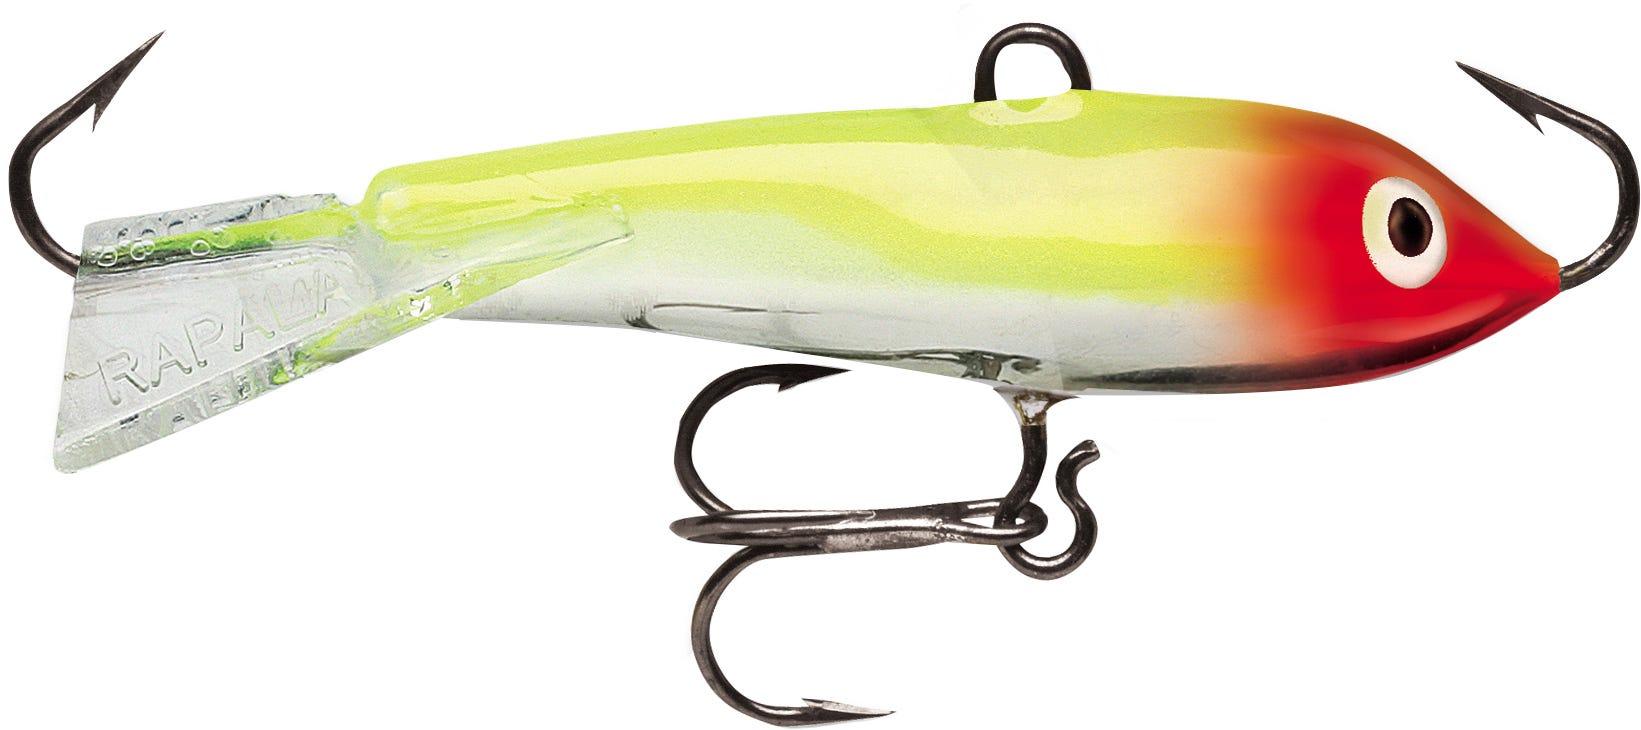 8 fishing bulk jigs lures 4oz  sardine baitfish spoons jigging no hooks